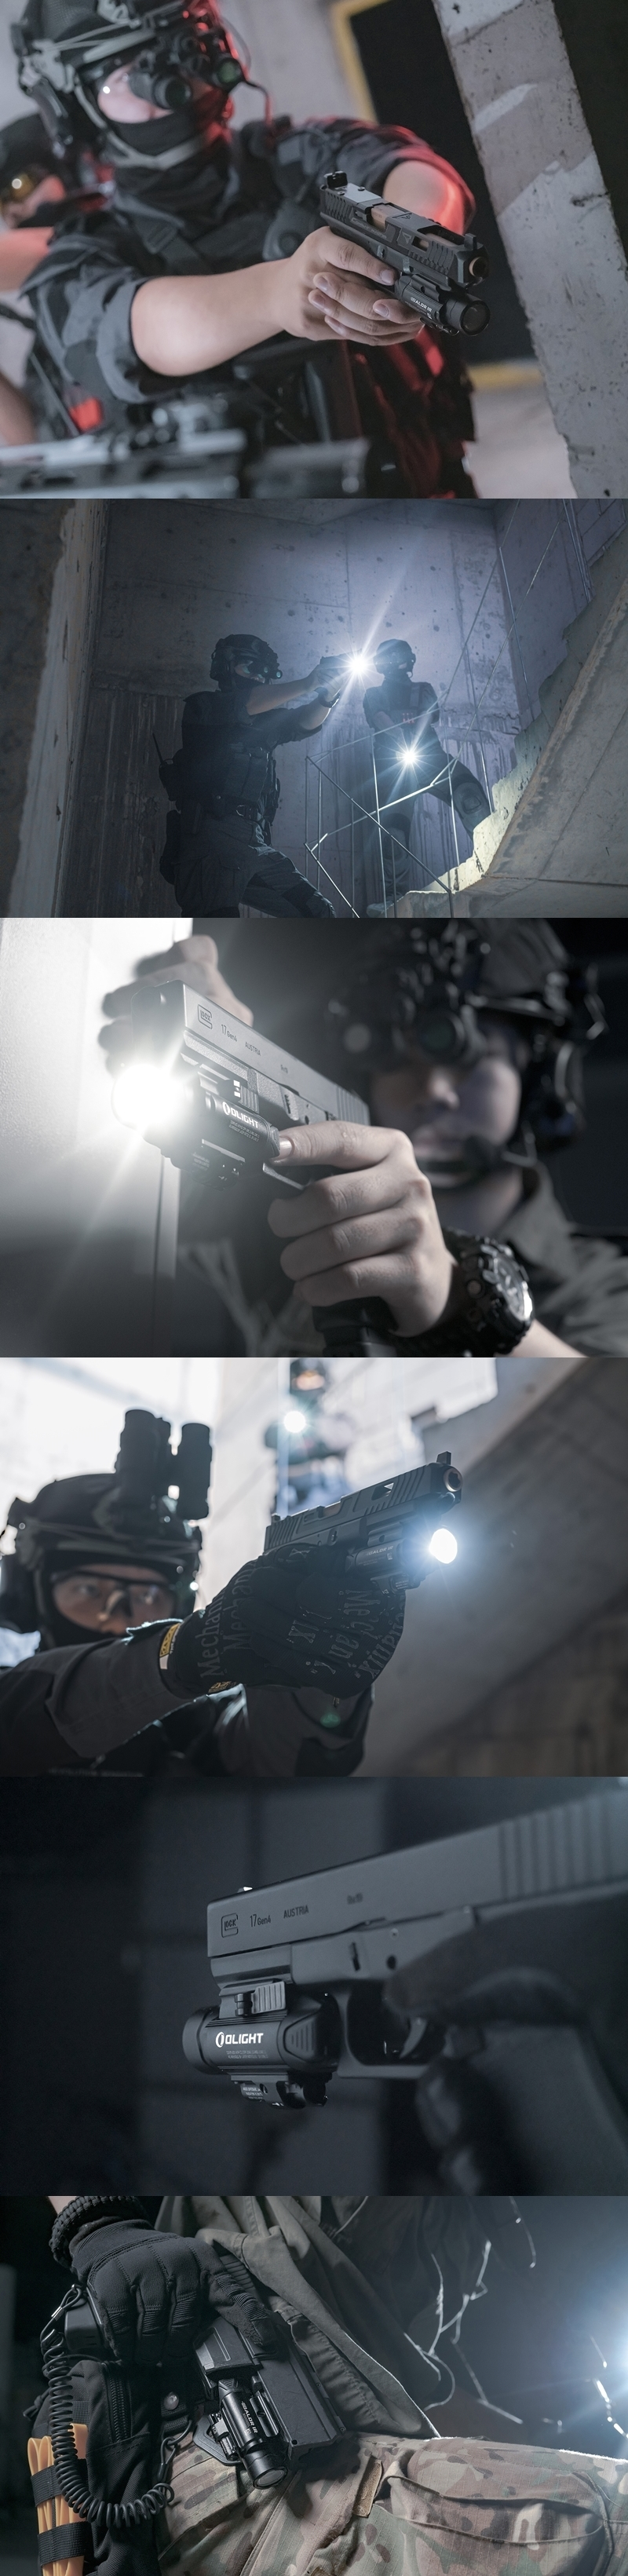 Baldr IR 1350流明 紅外線 瞄準器 白光LED 戰術 槍燈 850nm 0.78mW 紅外線光束 錸特光電 OLIGHT 台灣總代理-14